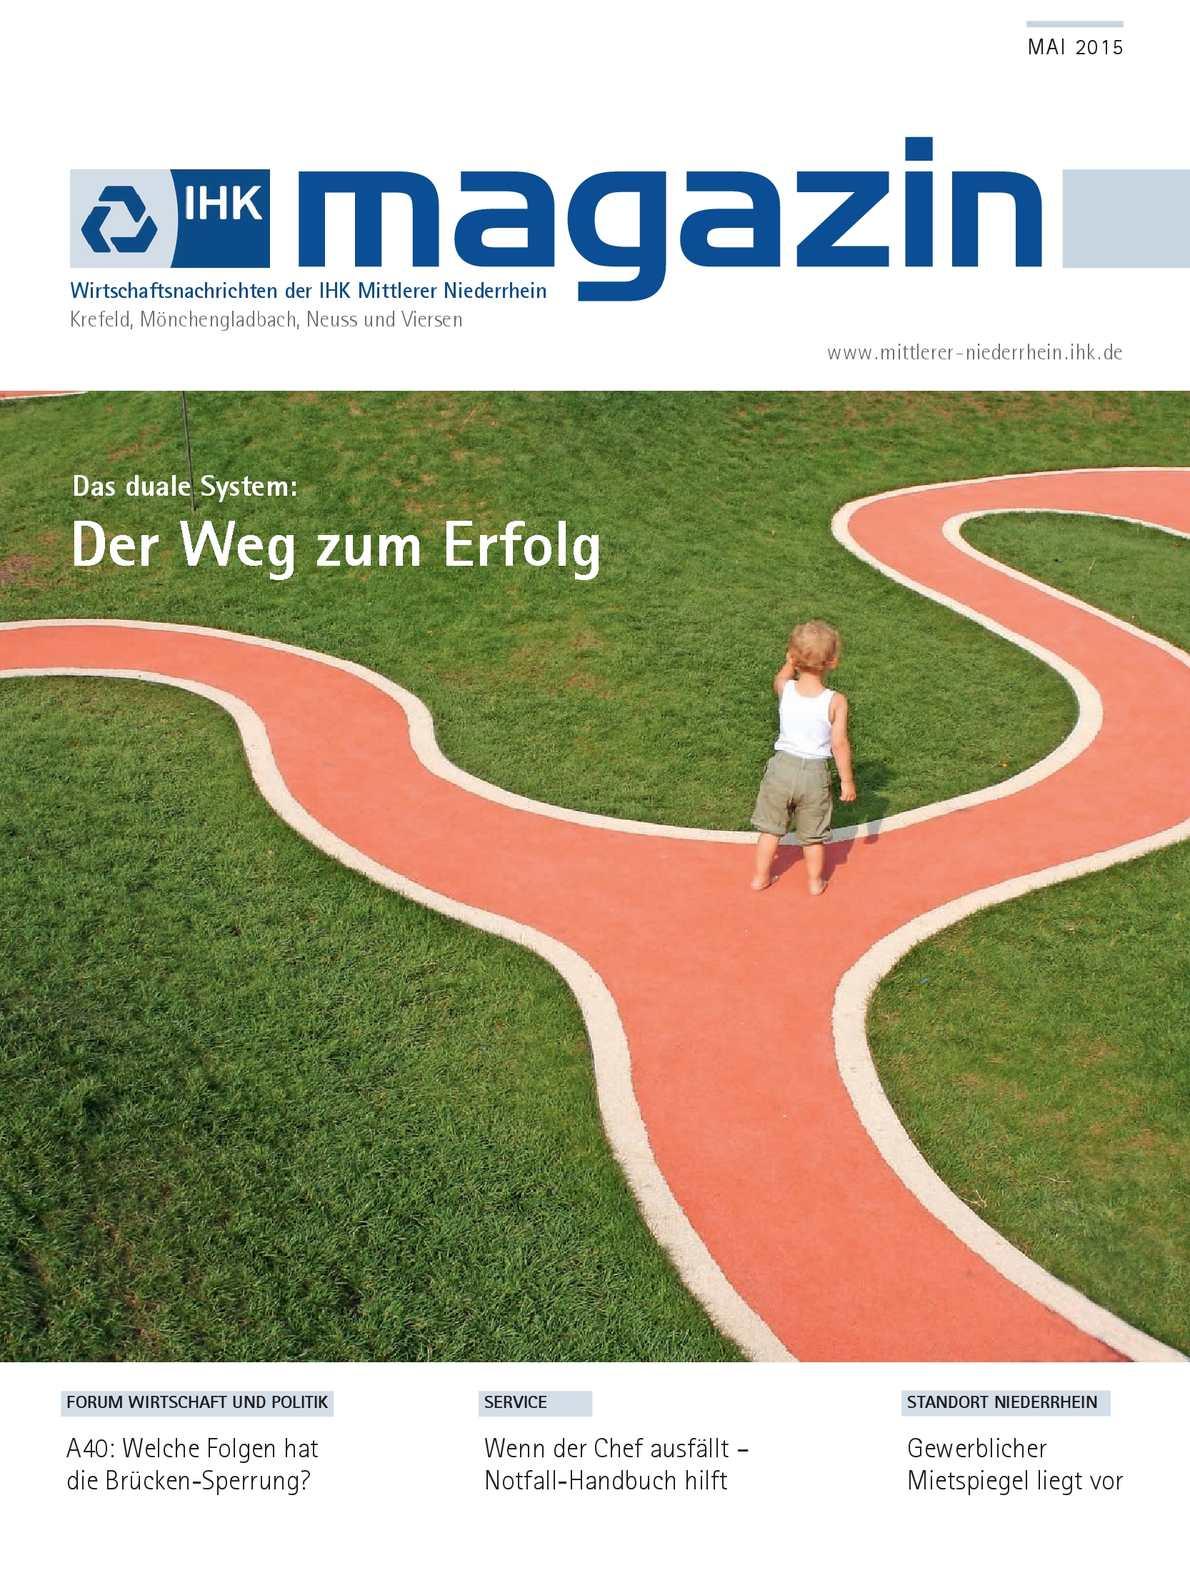 Azubi speed dating mönchengladbach 2015